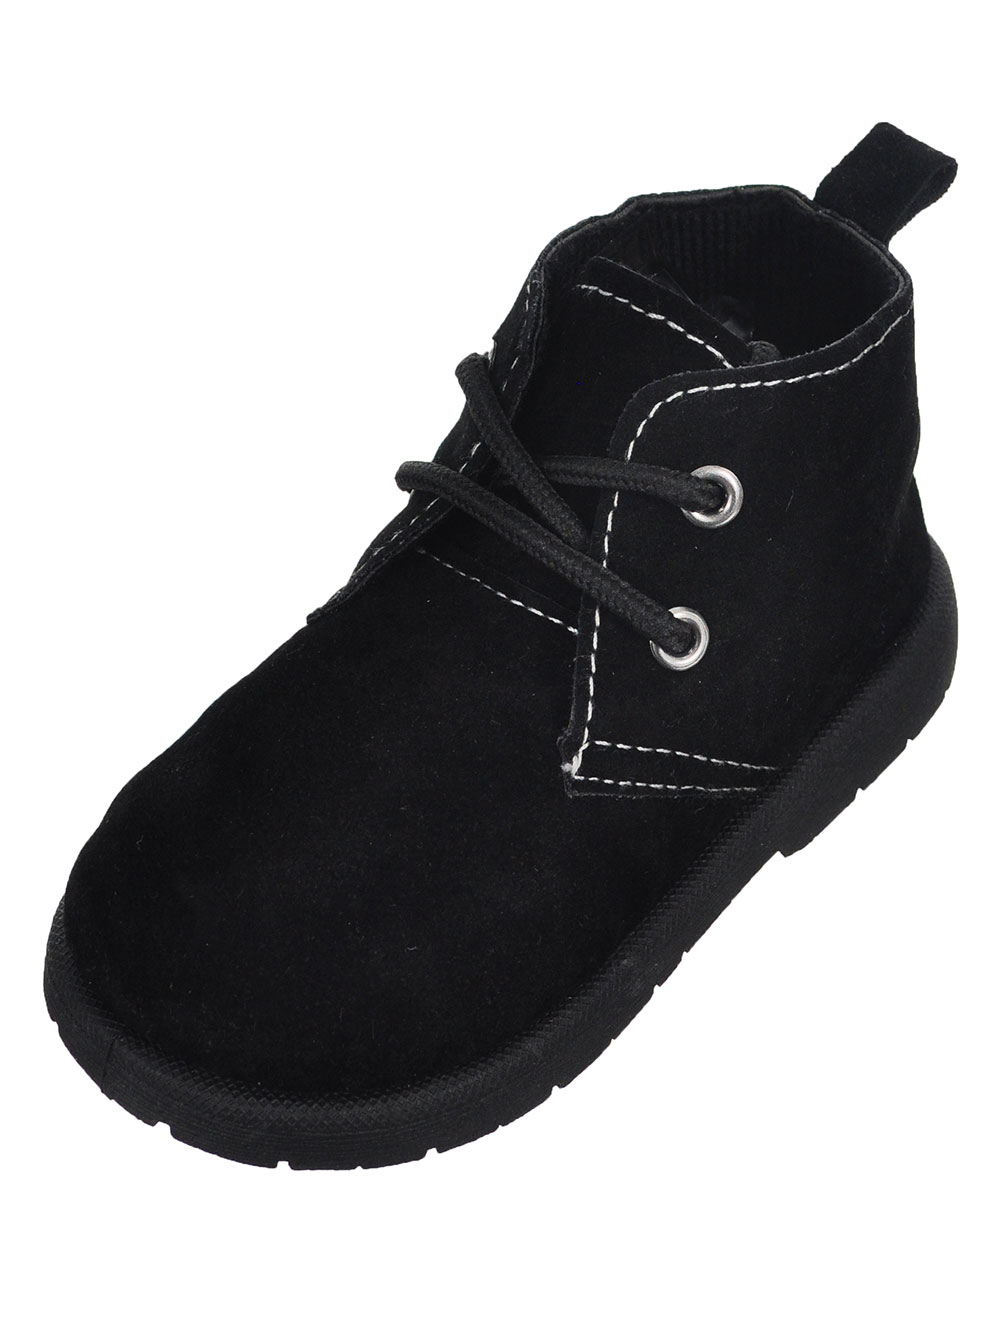 Tendertoes Boys' Hi-Top Boots (Sizes 2 - 6)